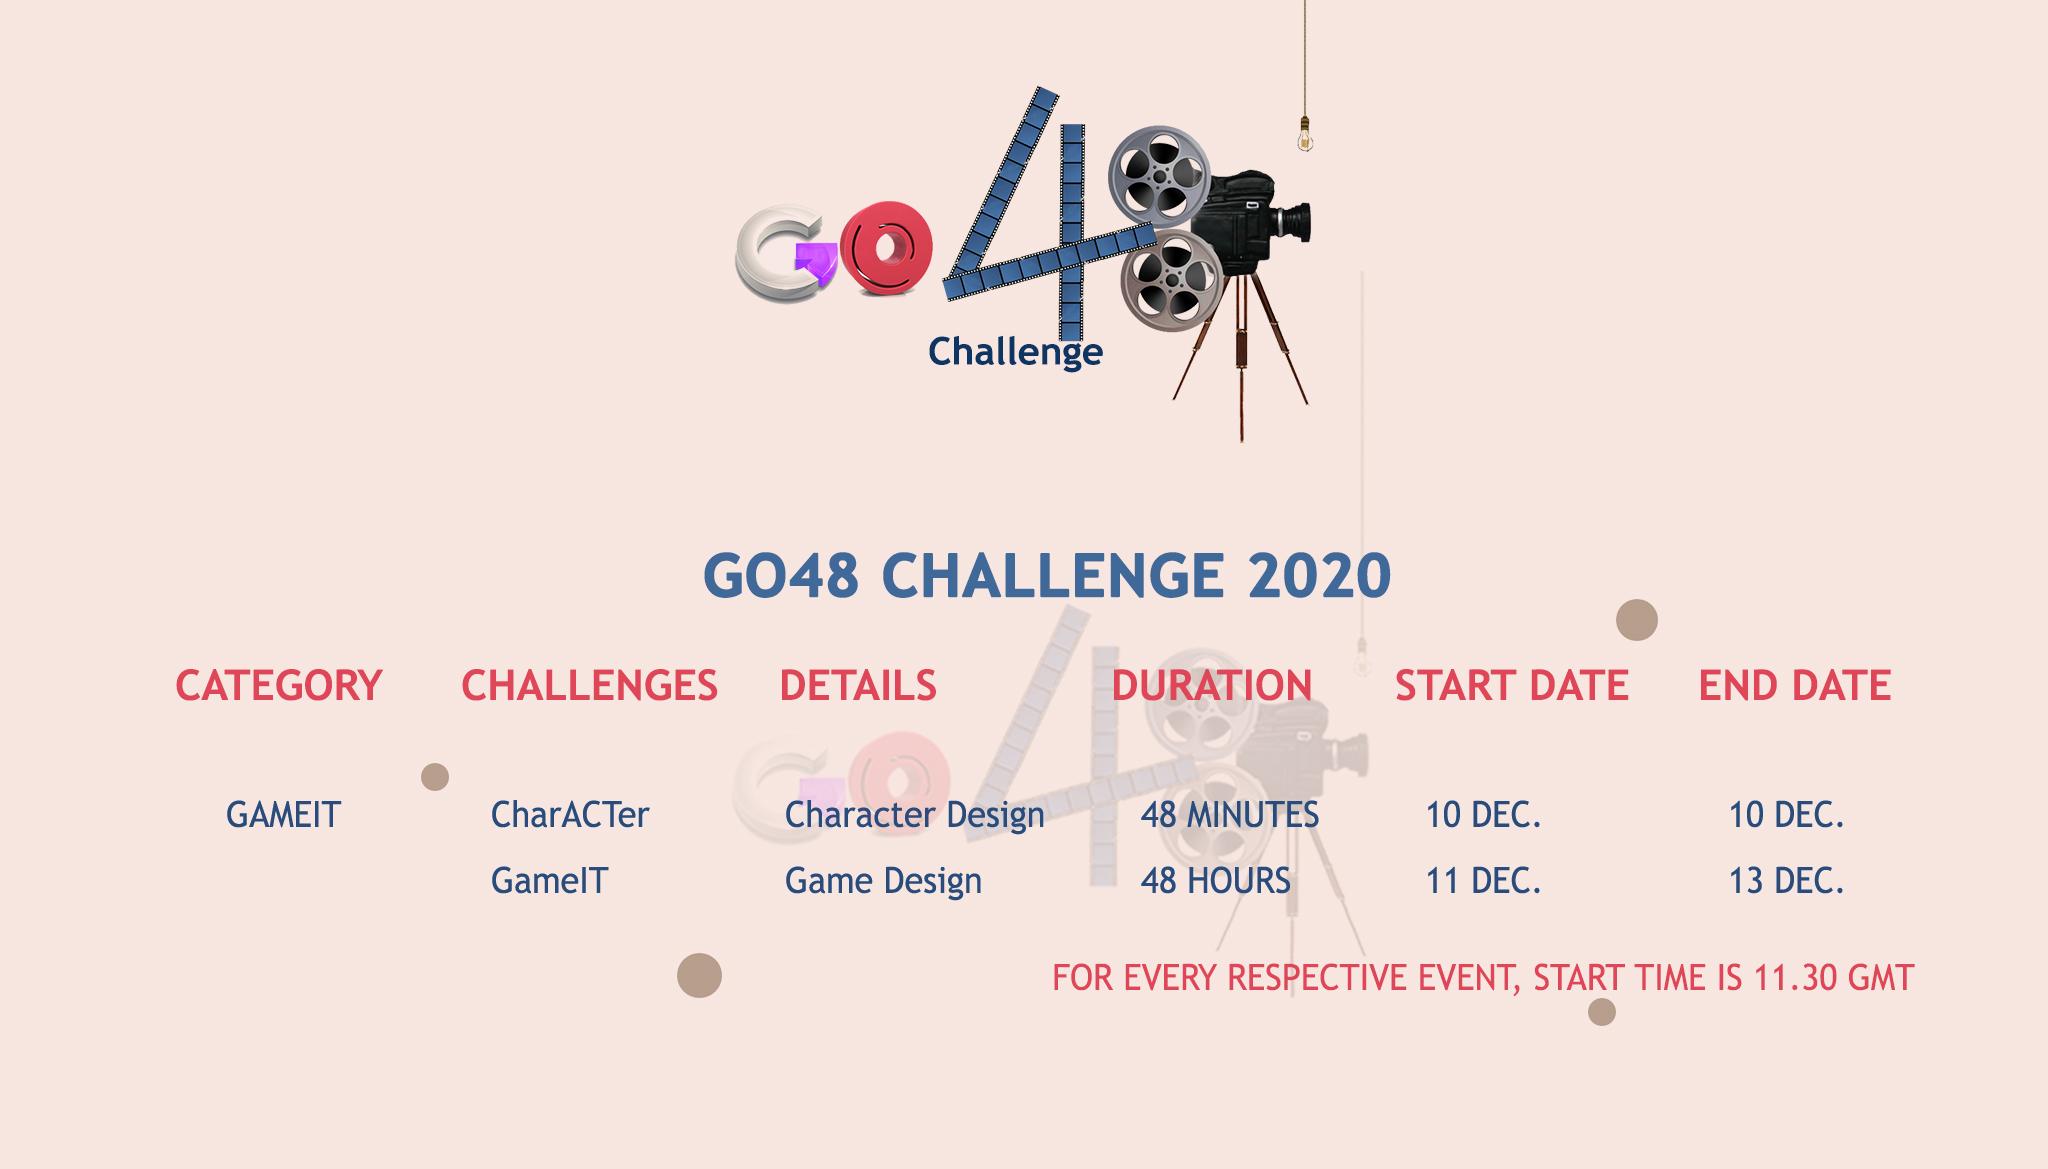 GO48 GameIT